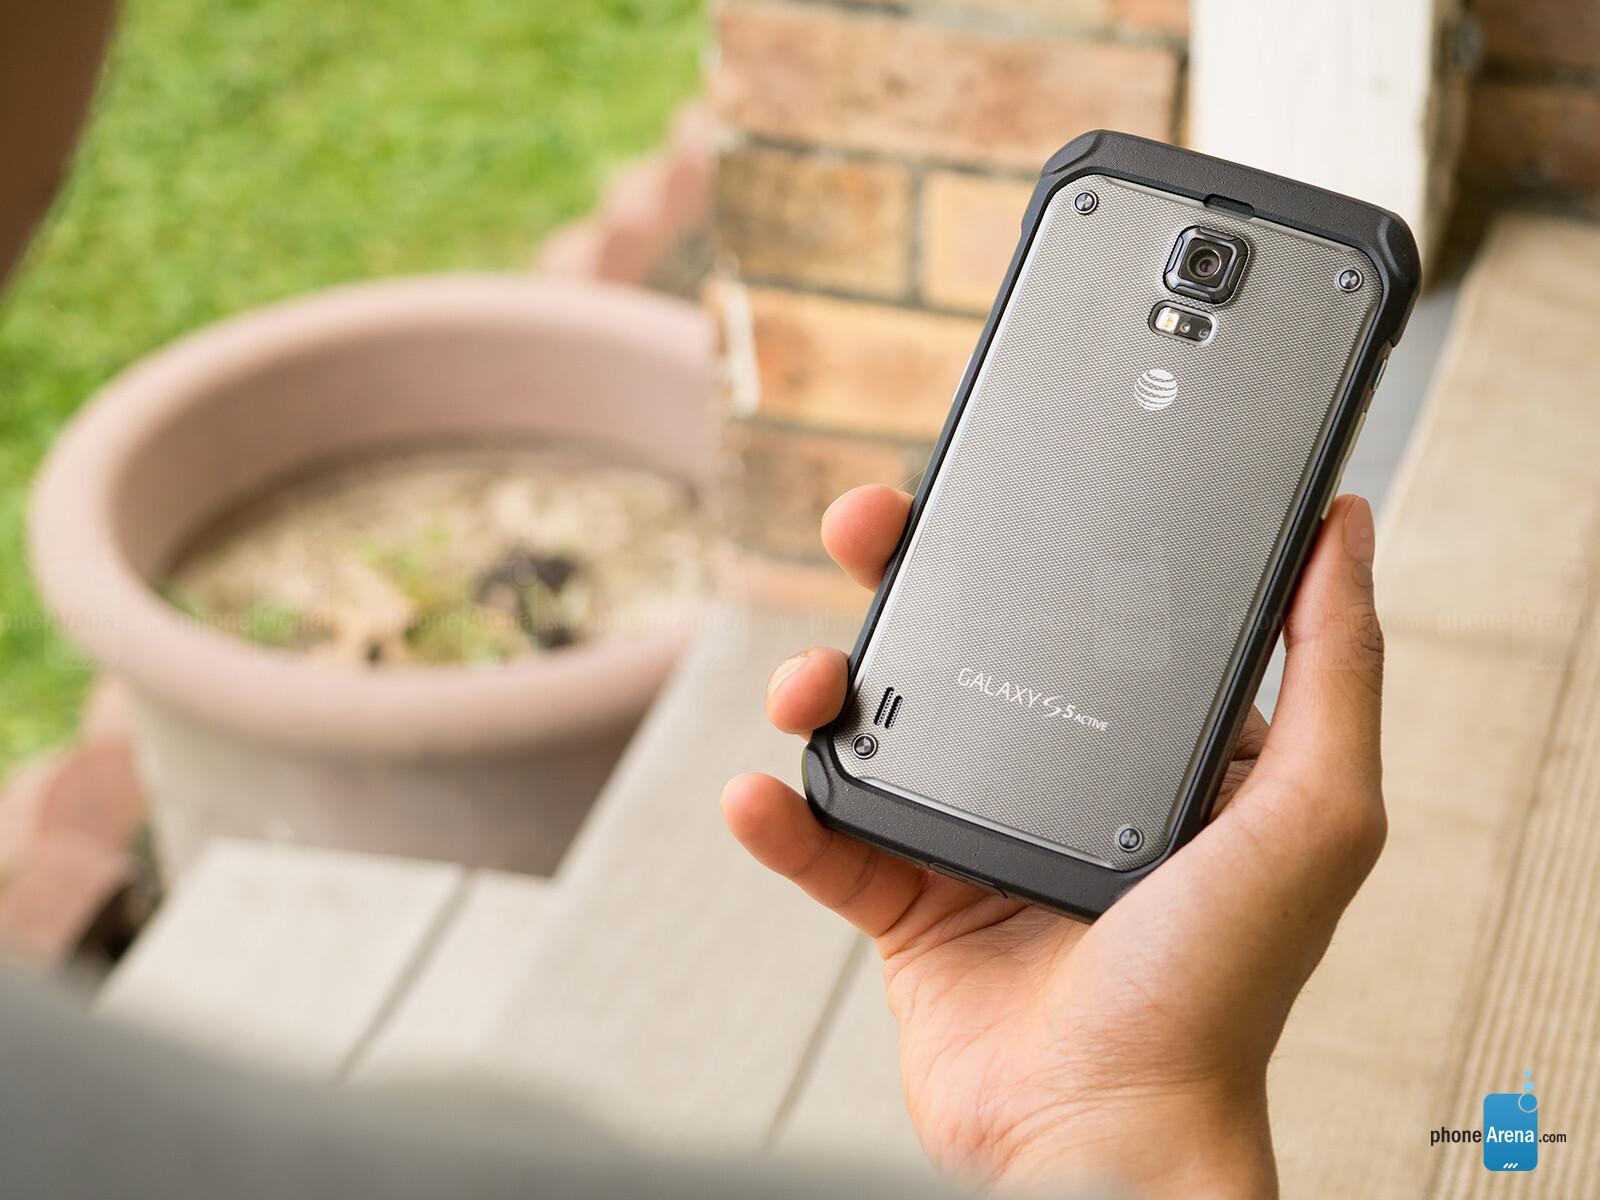 Samsung Galaxy S5 Active Review - PhoneArena